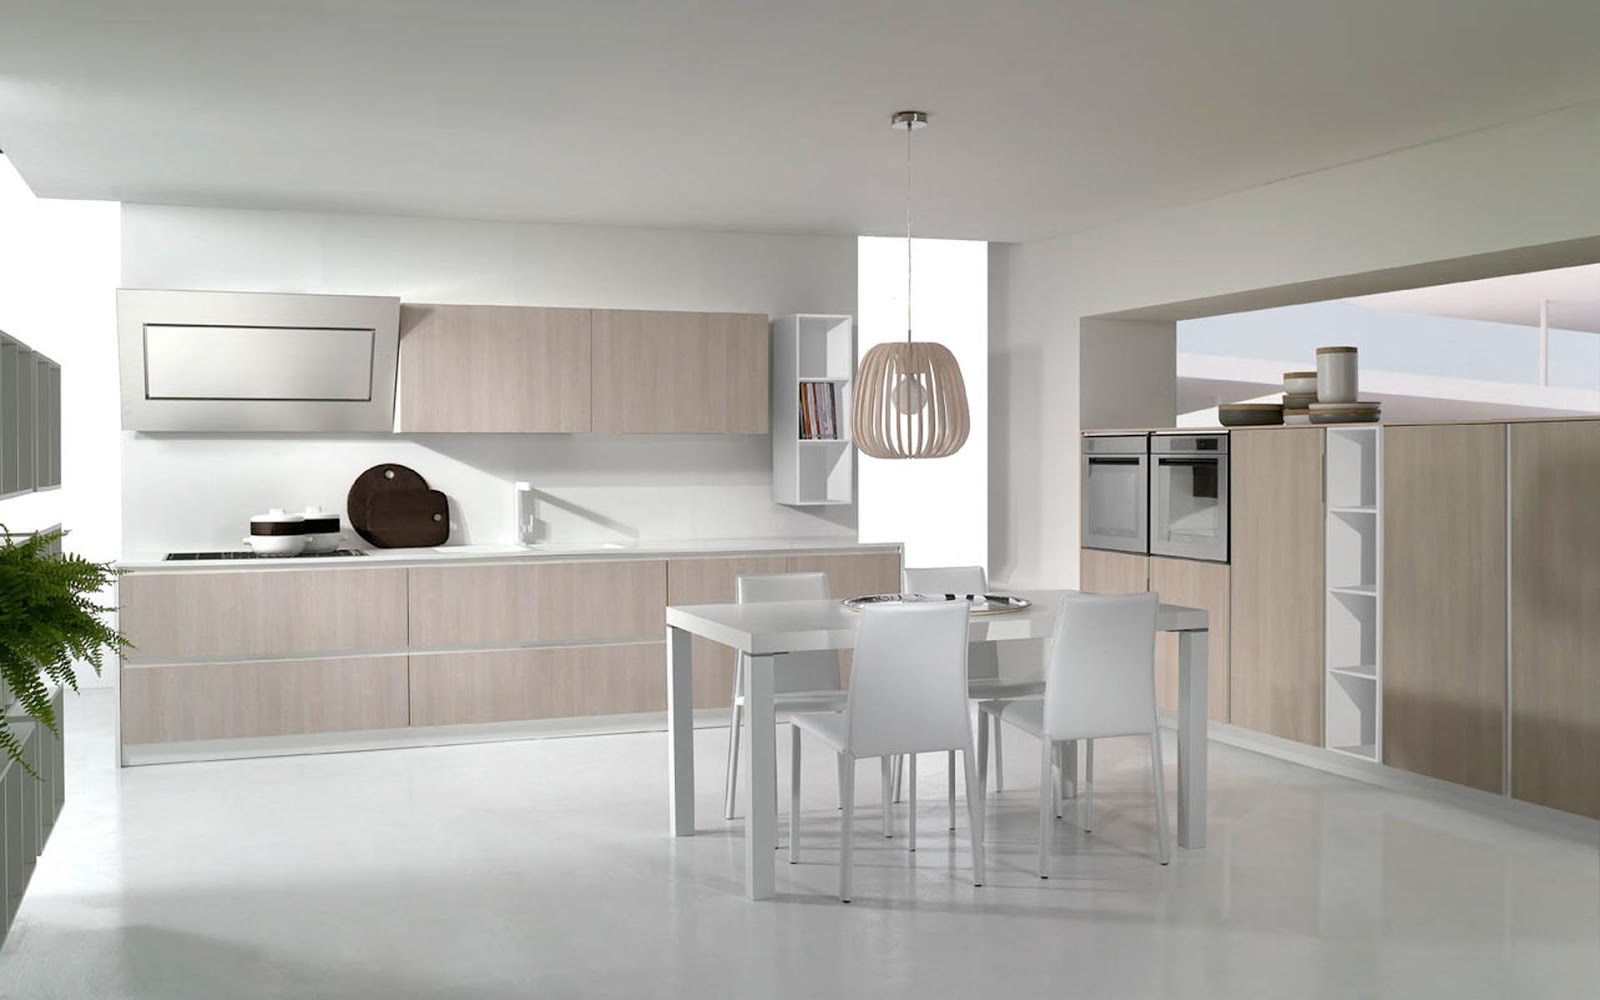 Cucina Moderna Piccola Quadrata   Sala Cucina Piccola Come Arredare ...